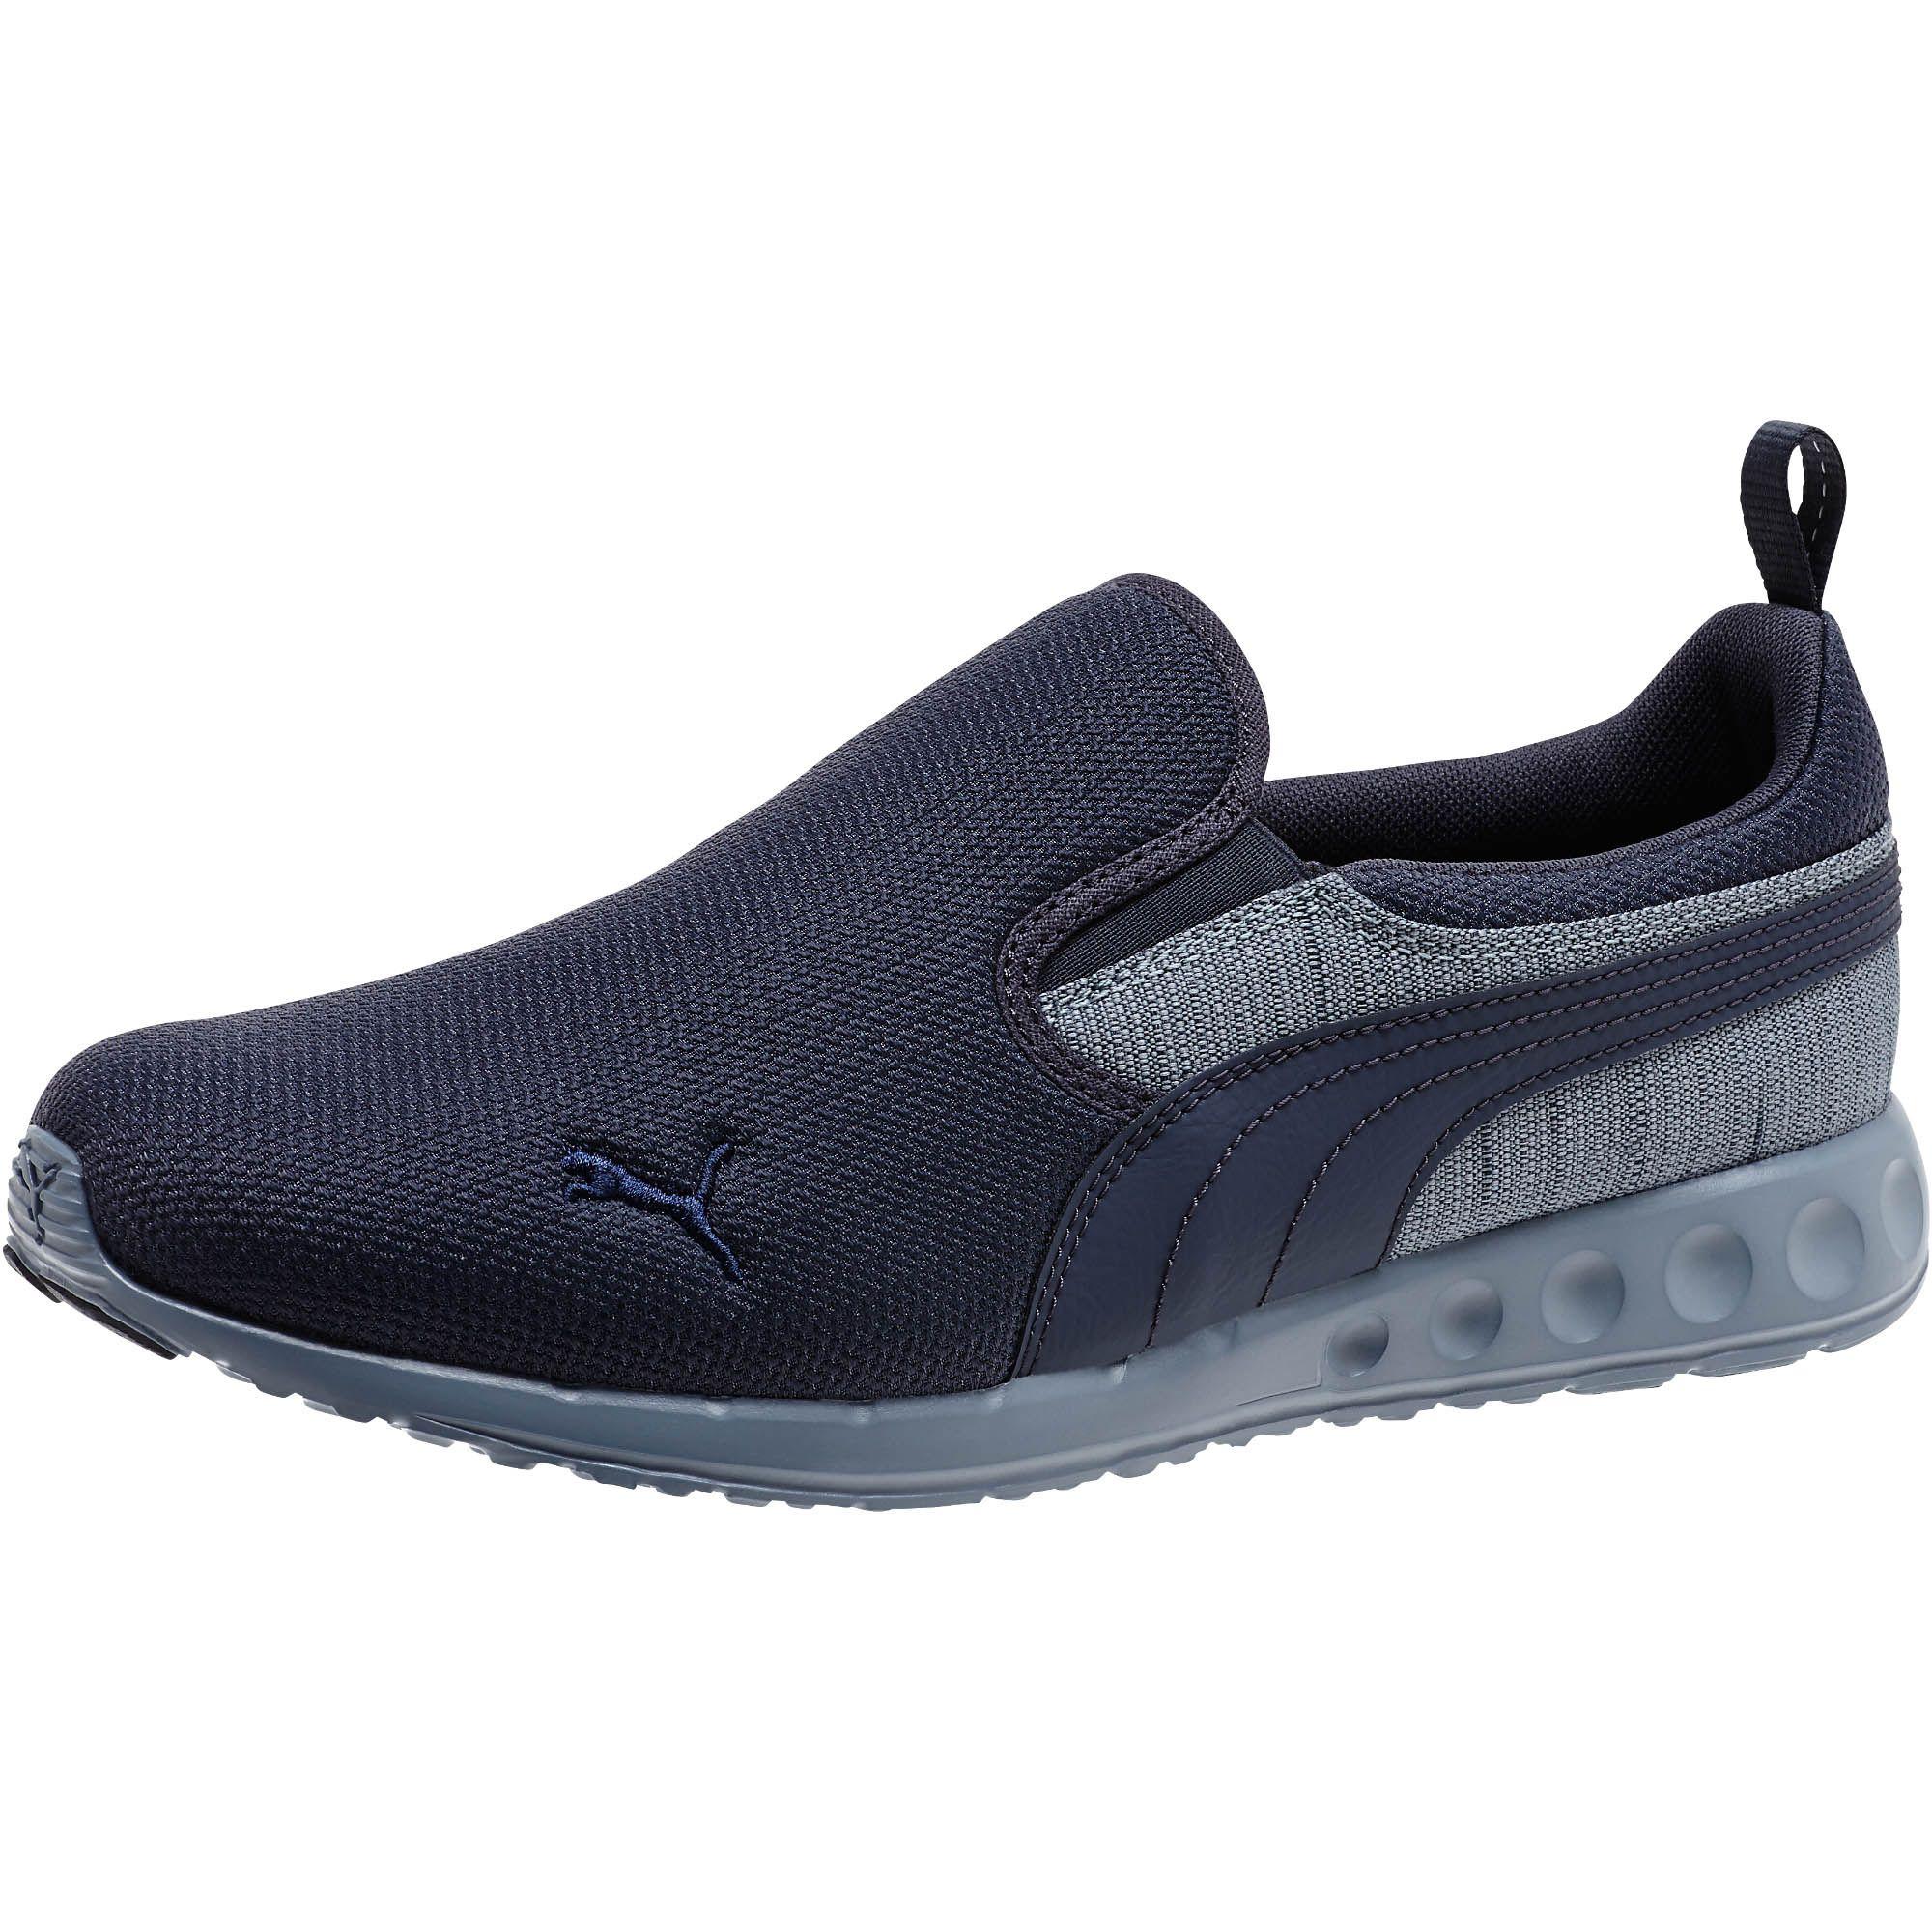 puma carson runner slip on trainers footwear neutral. Black Bedroom Furniture Sets. Home Design Ideas